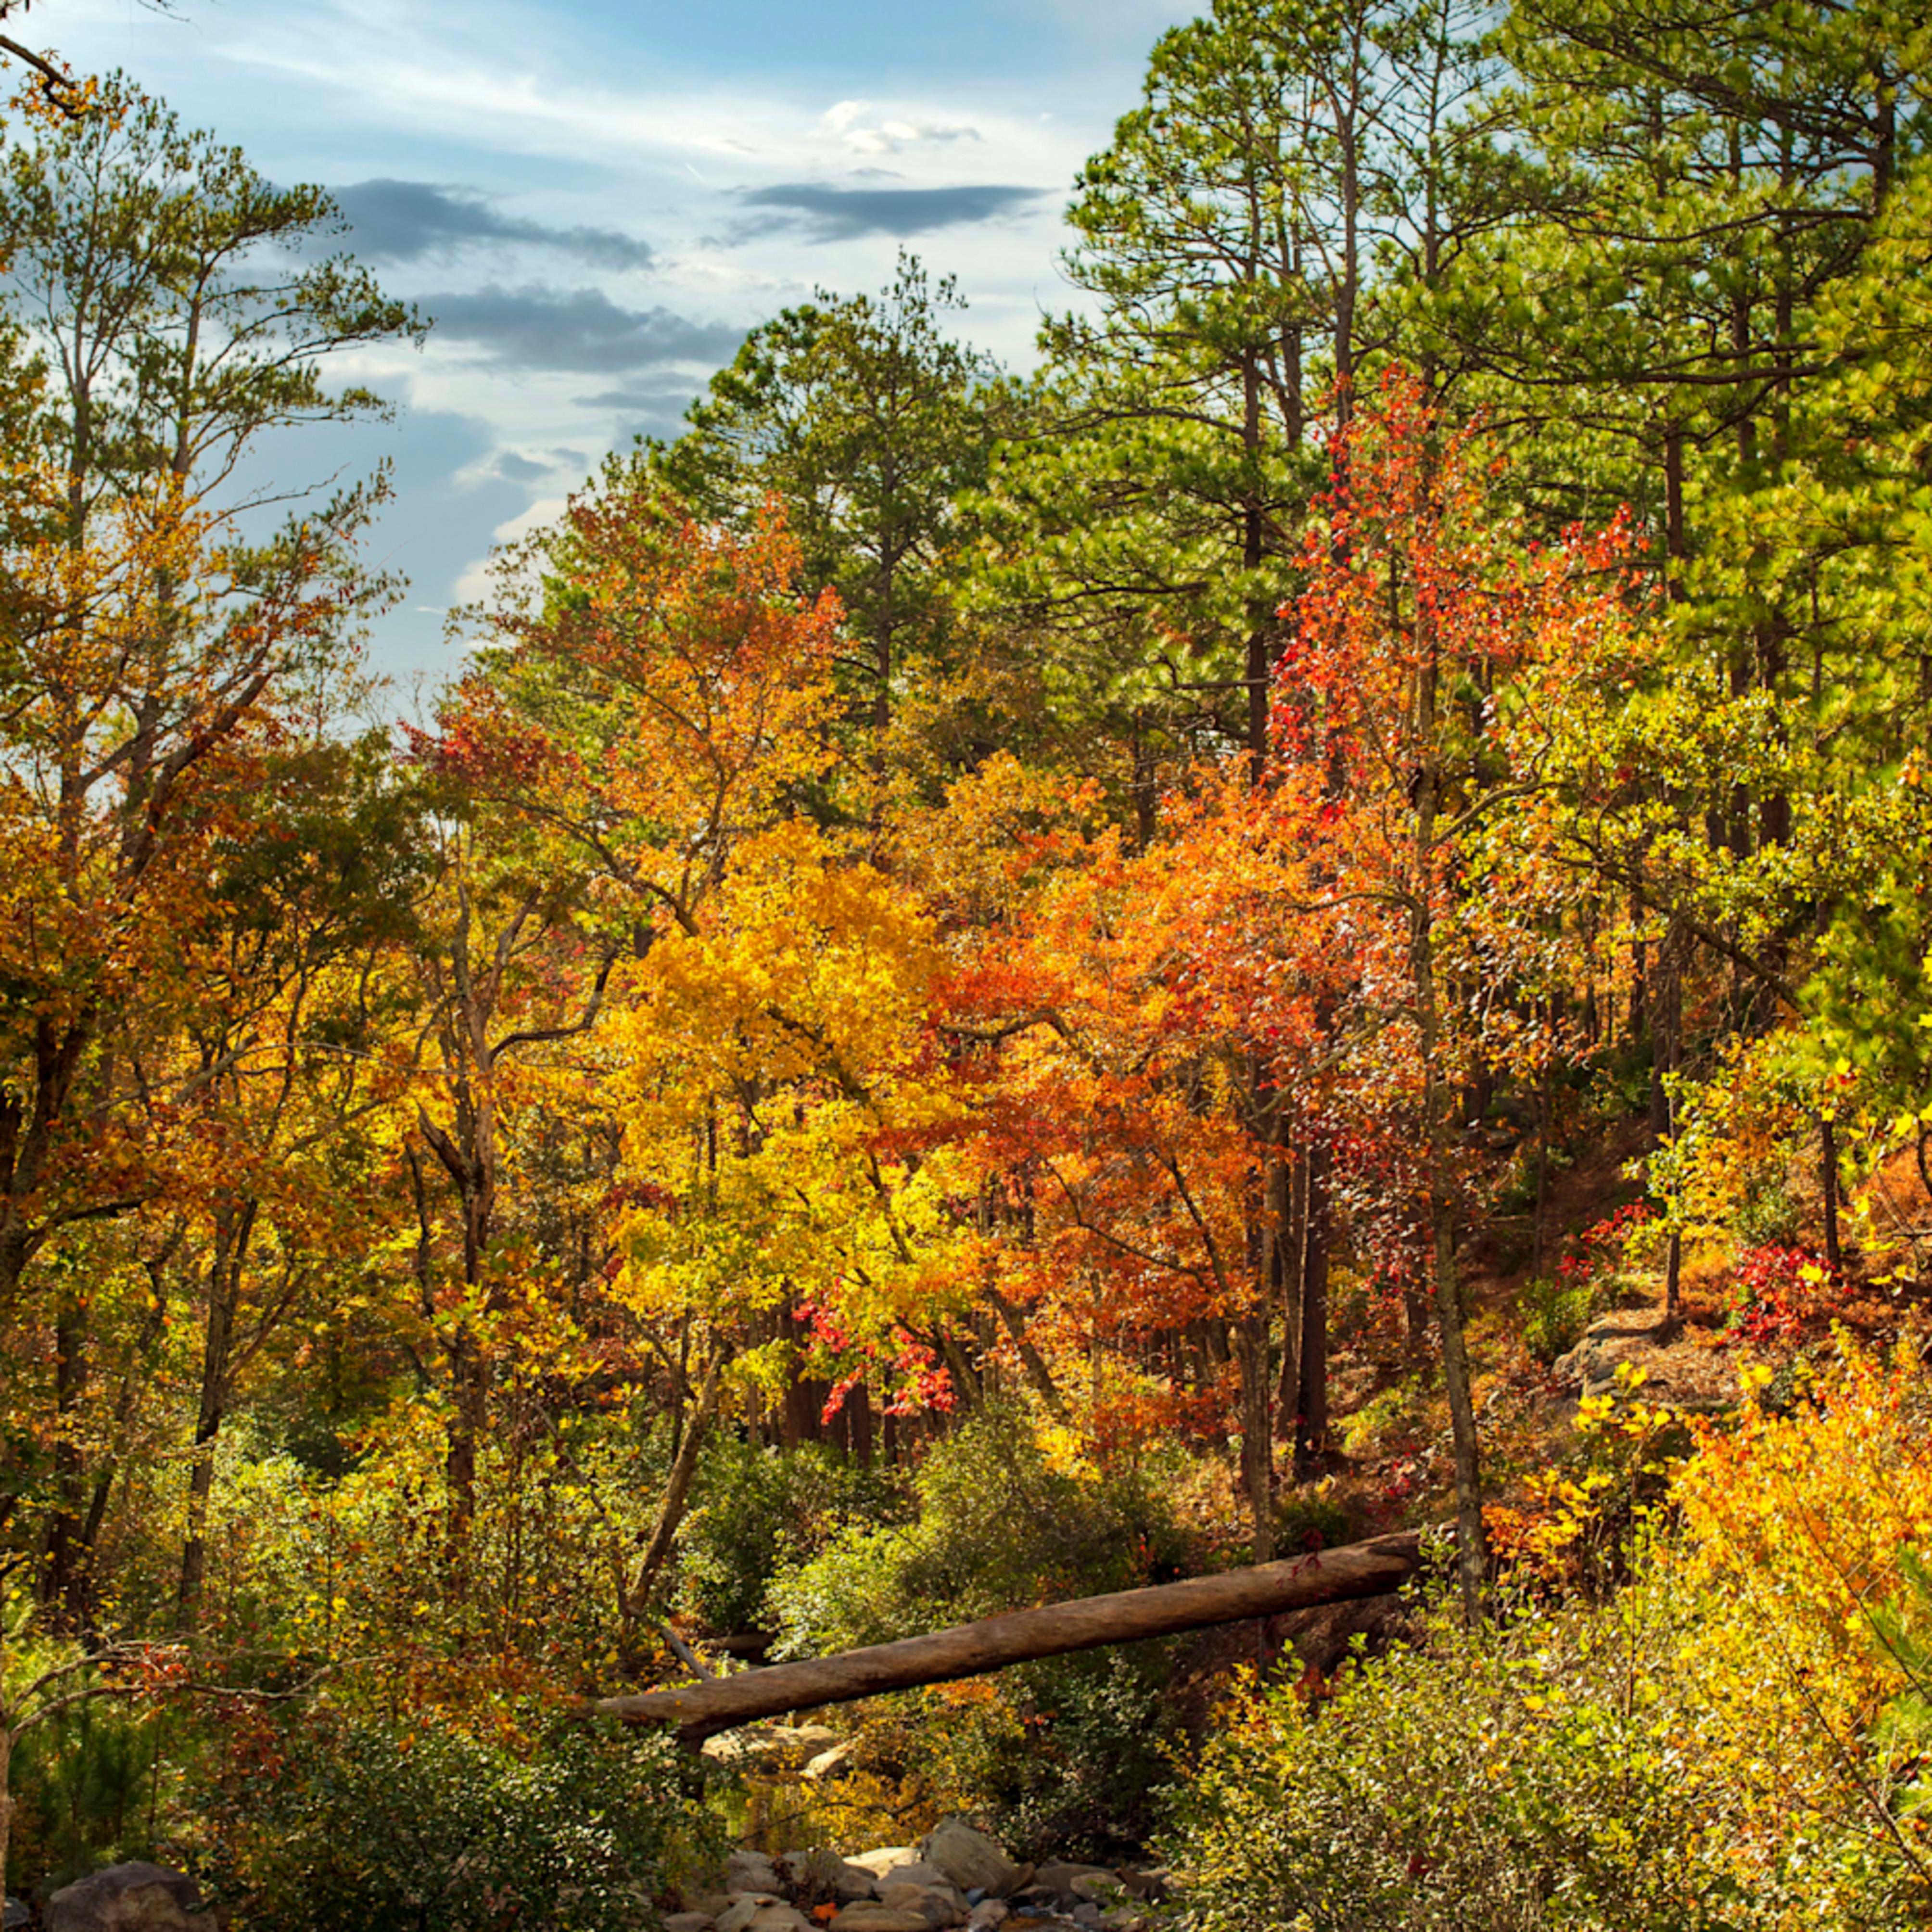 Creek fall 5 jzkonm